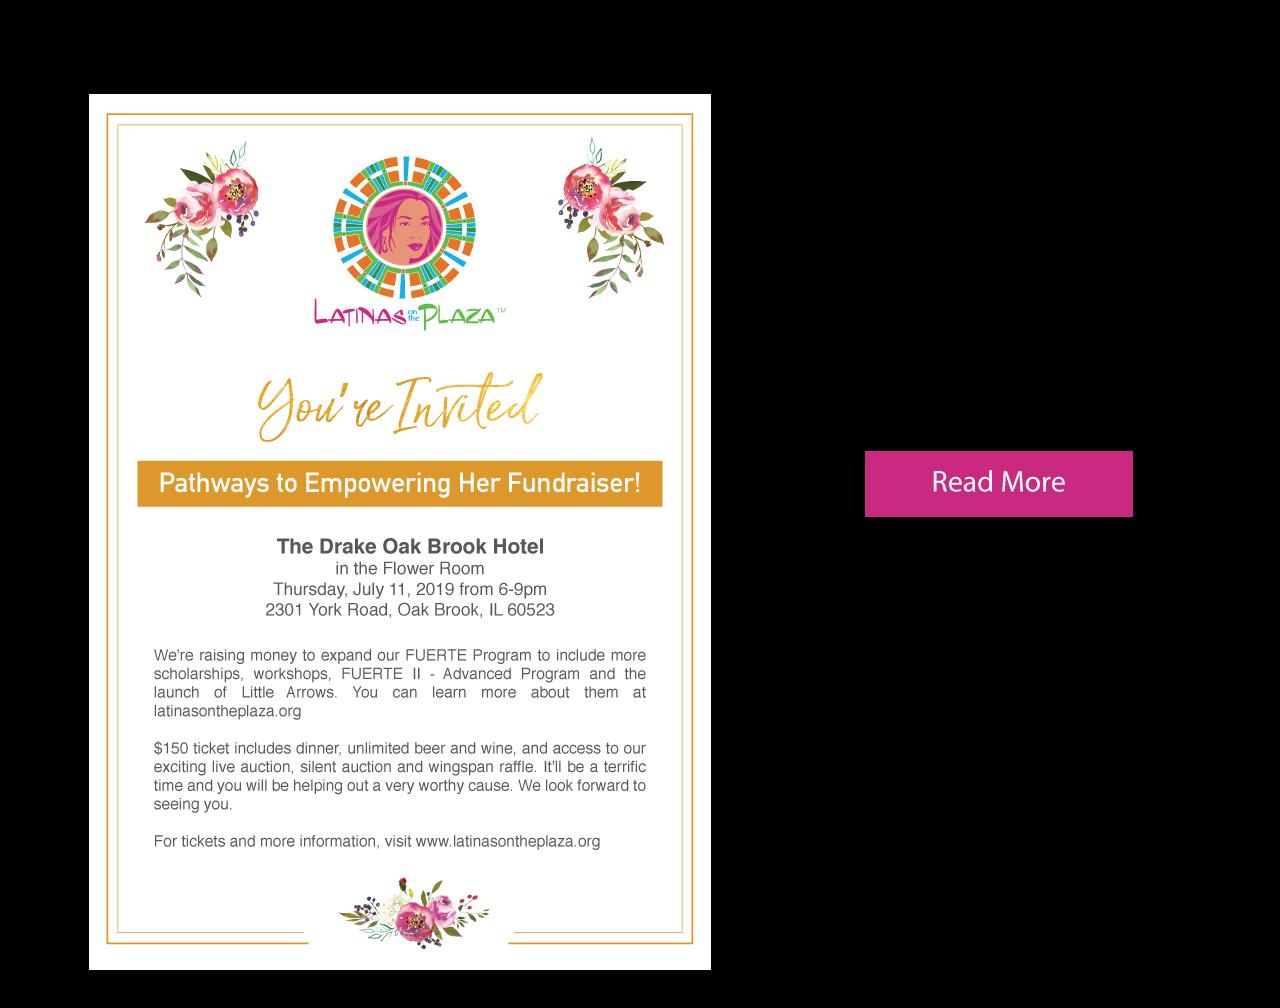 Pathways to empowering fundraiser